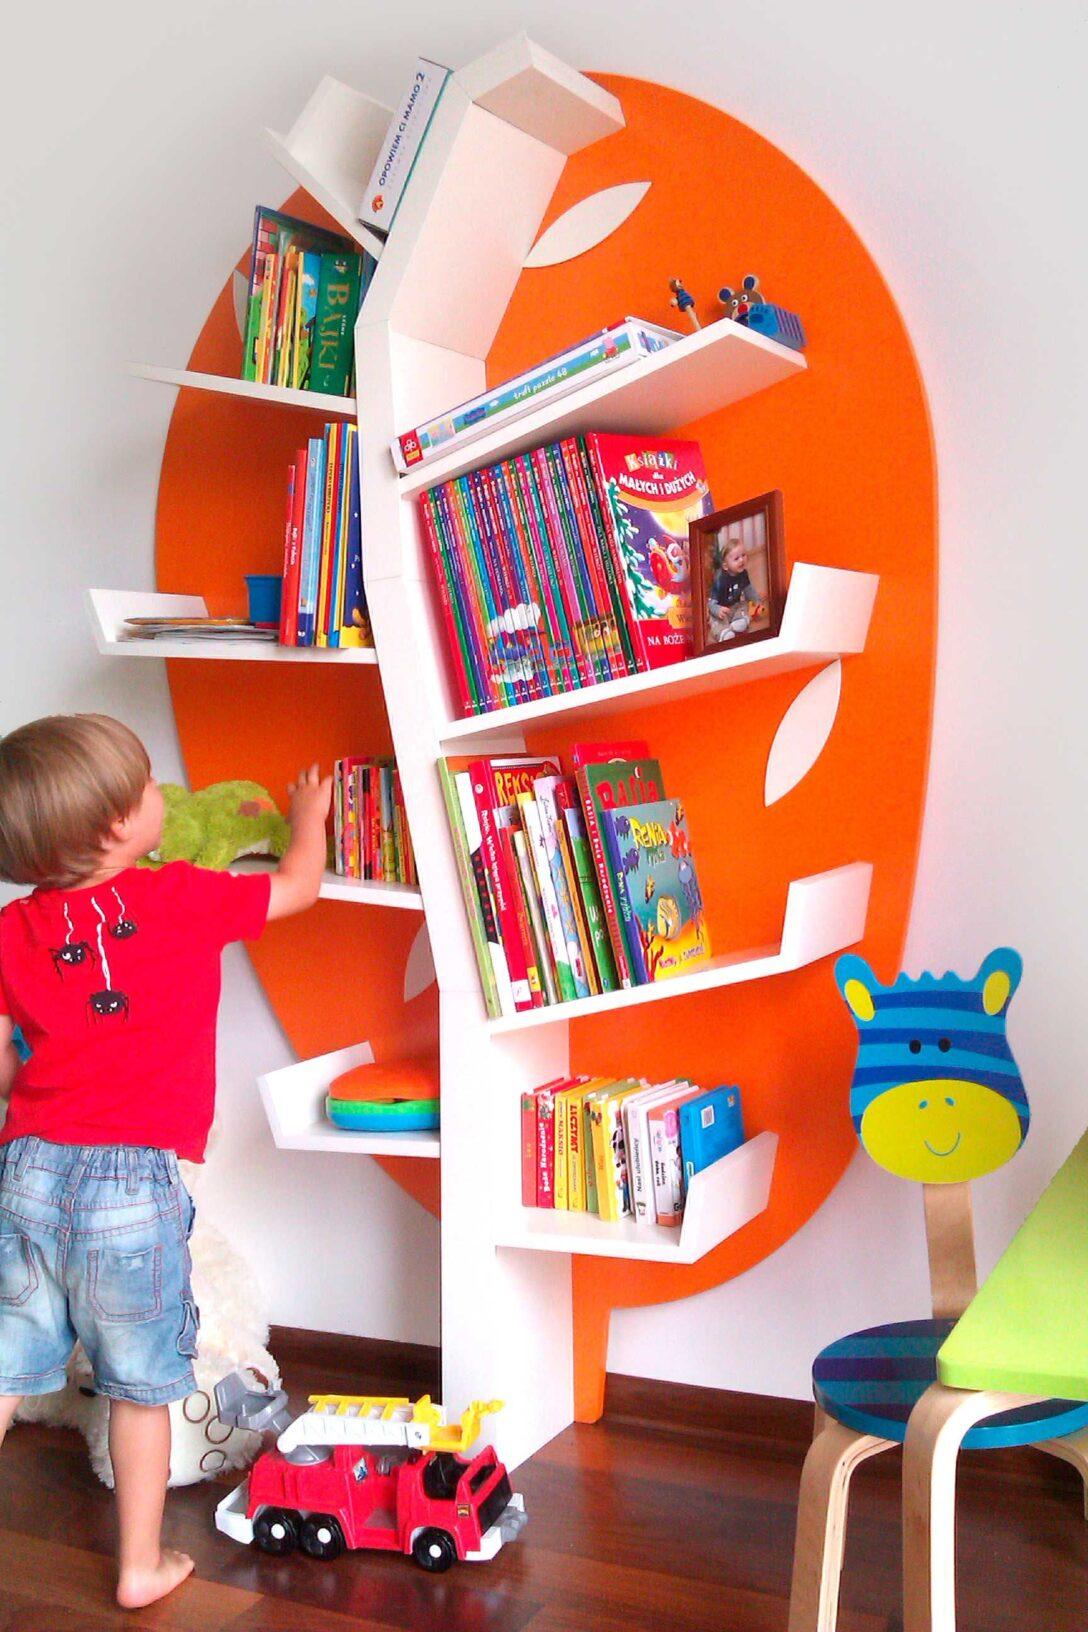 Large Size of Kinderzimmer Bücherregal Bcherregal Baum Plus Regal In Baumform Light Line Weiß Sofa Regale Kinderzimmer Kinderzimmer Bücherregal